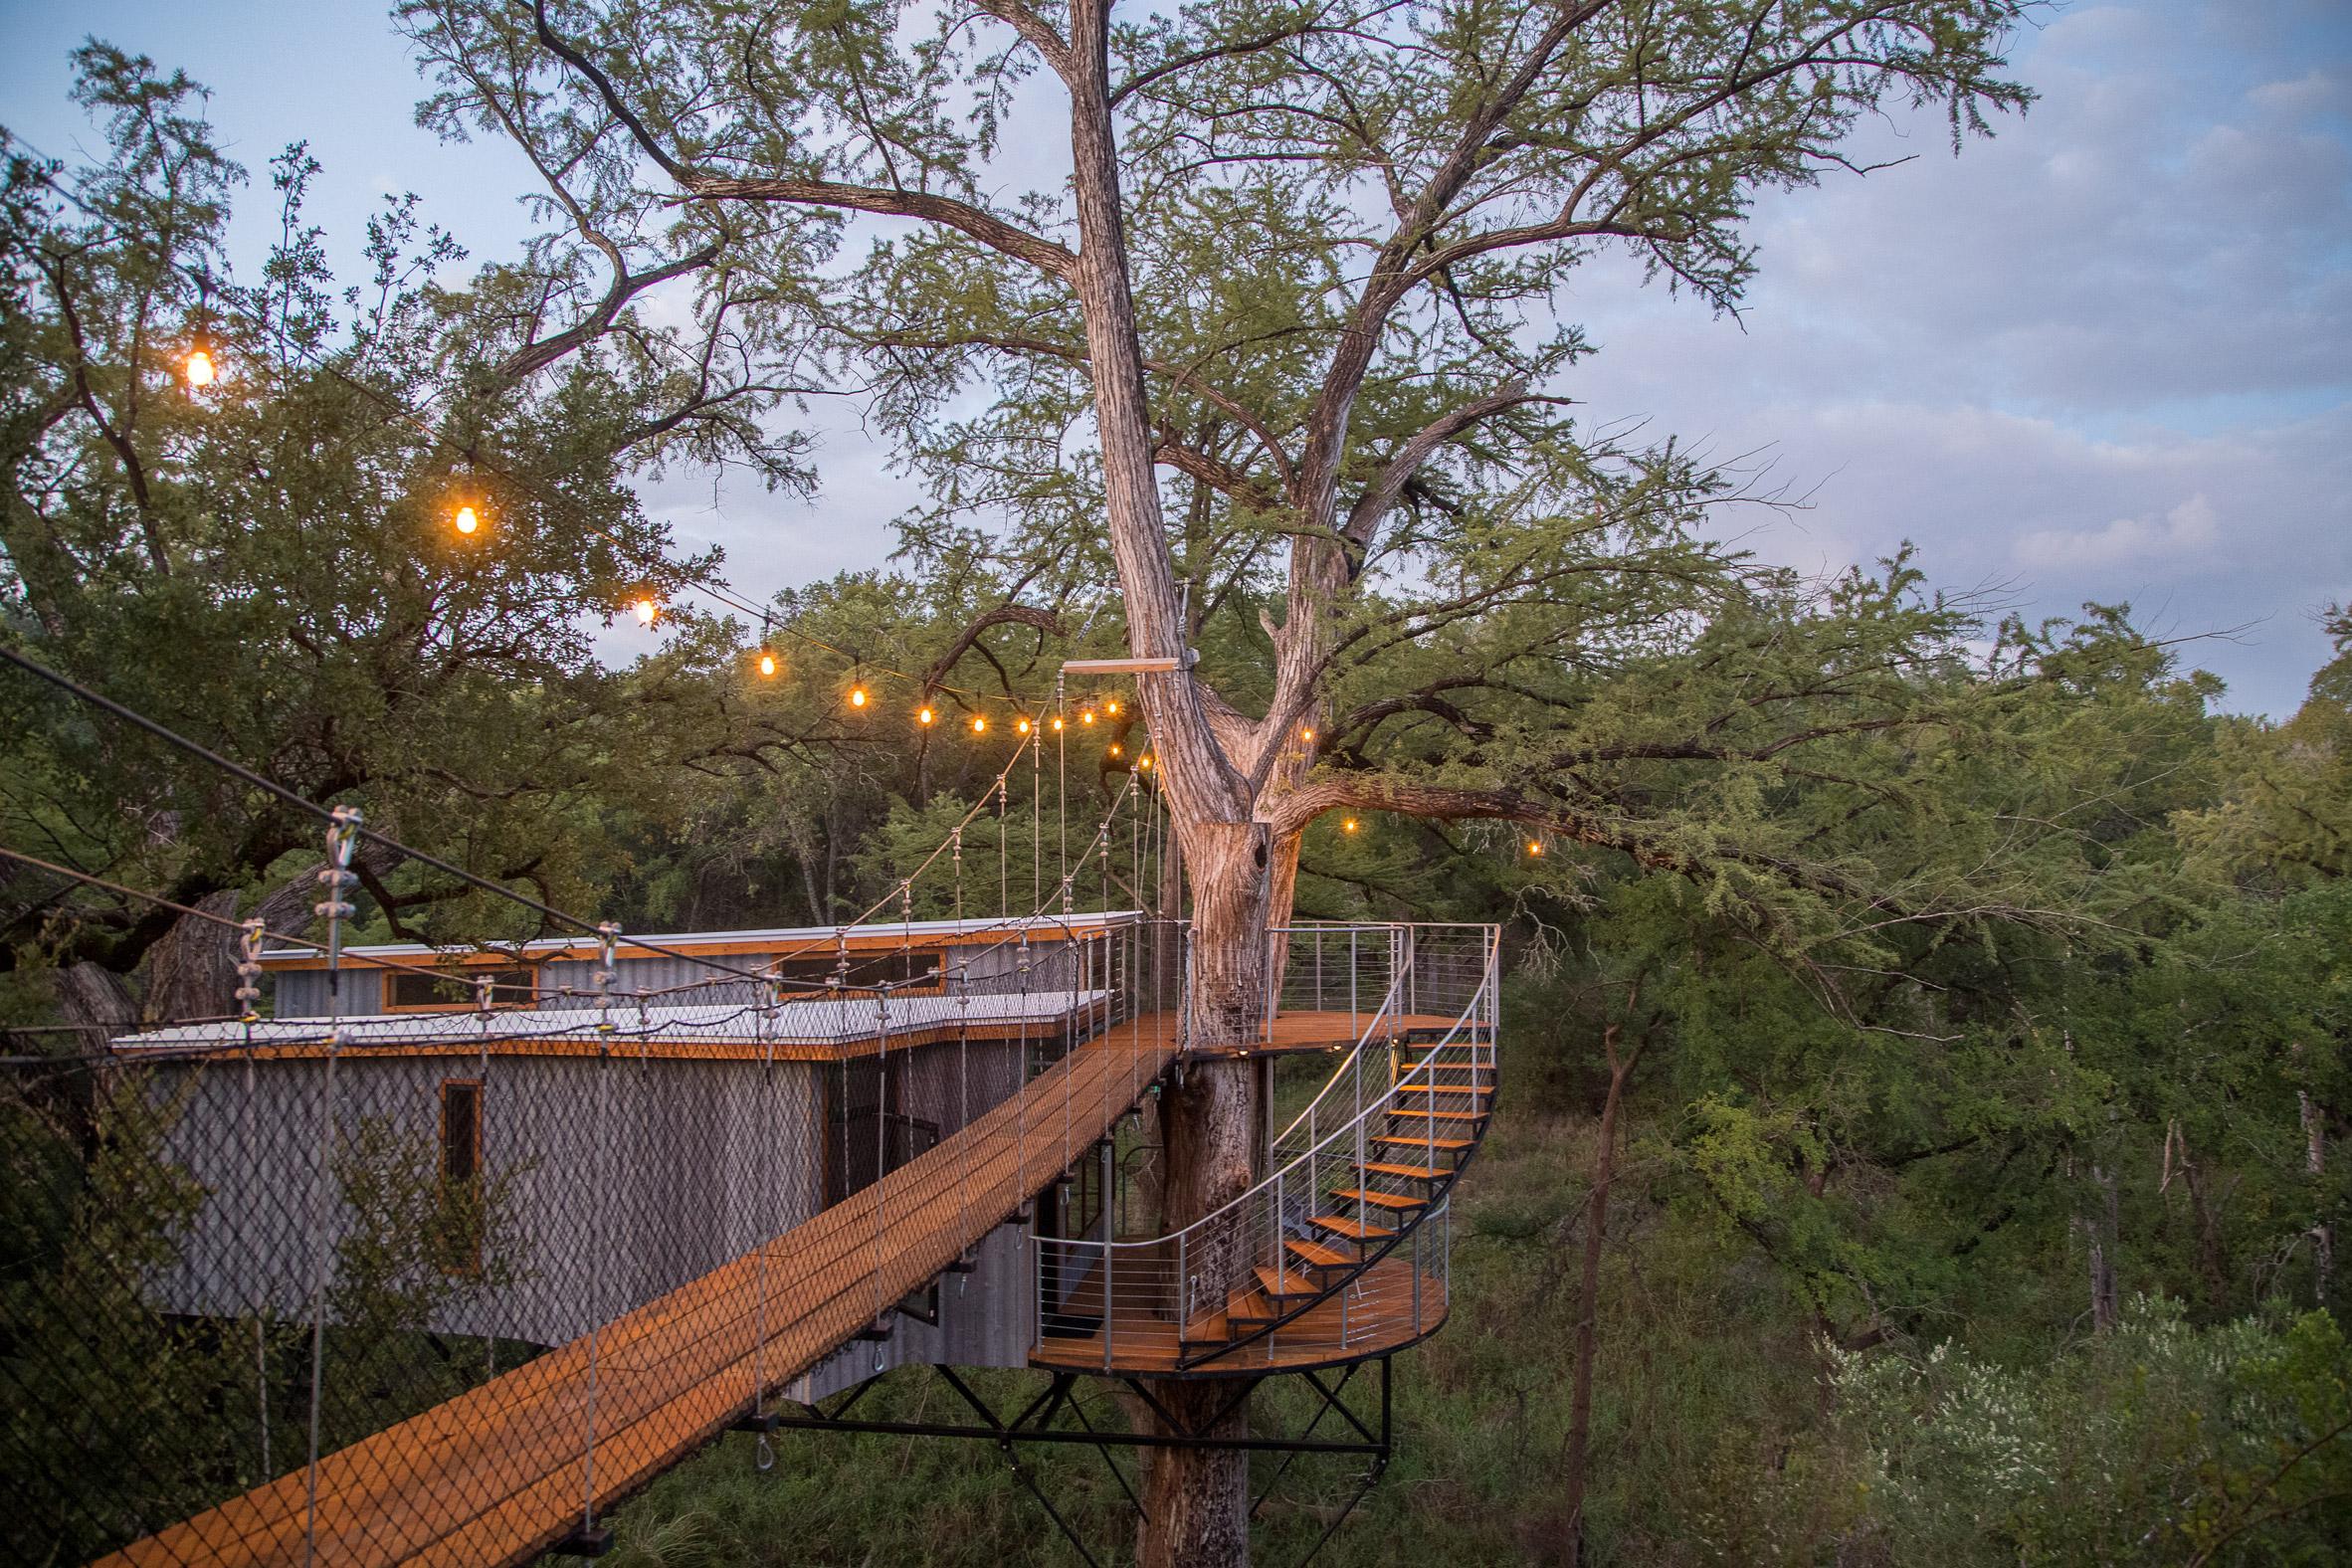 Puente colgante / Smiling Forest/ArtisTree